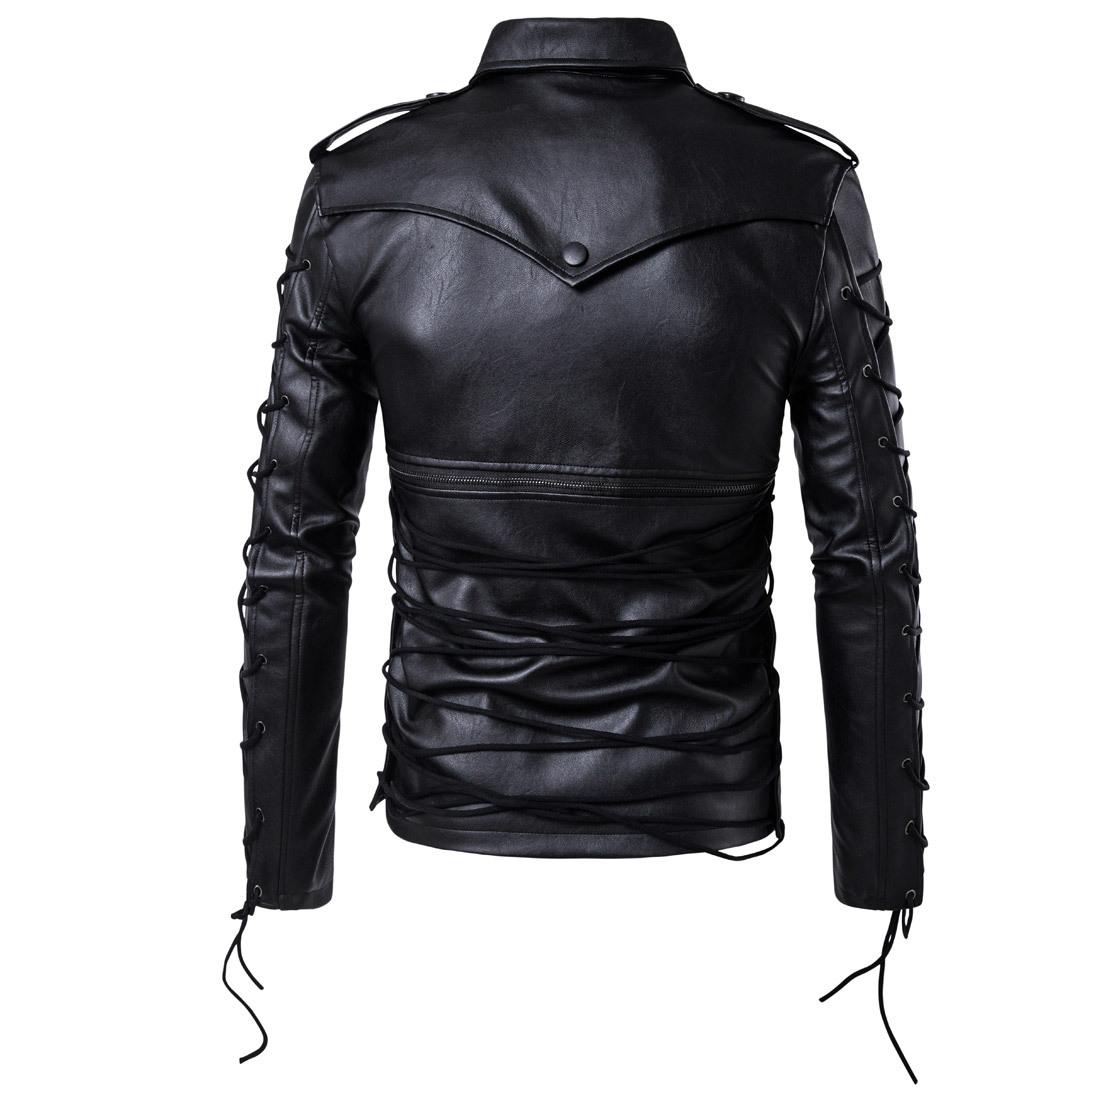 rebelsmarket_mens_lace_up_slim_fitted_multi_zipper_faux_leather_motorcycle_jacket_jackets_4.jpg